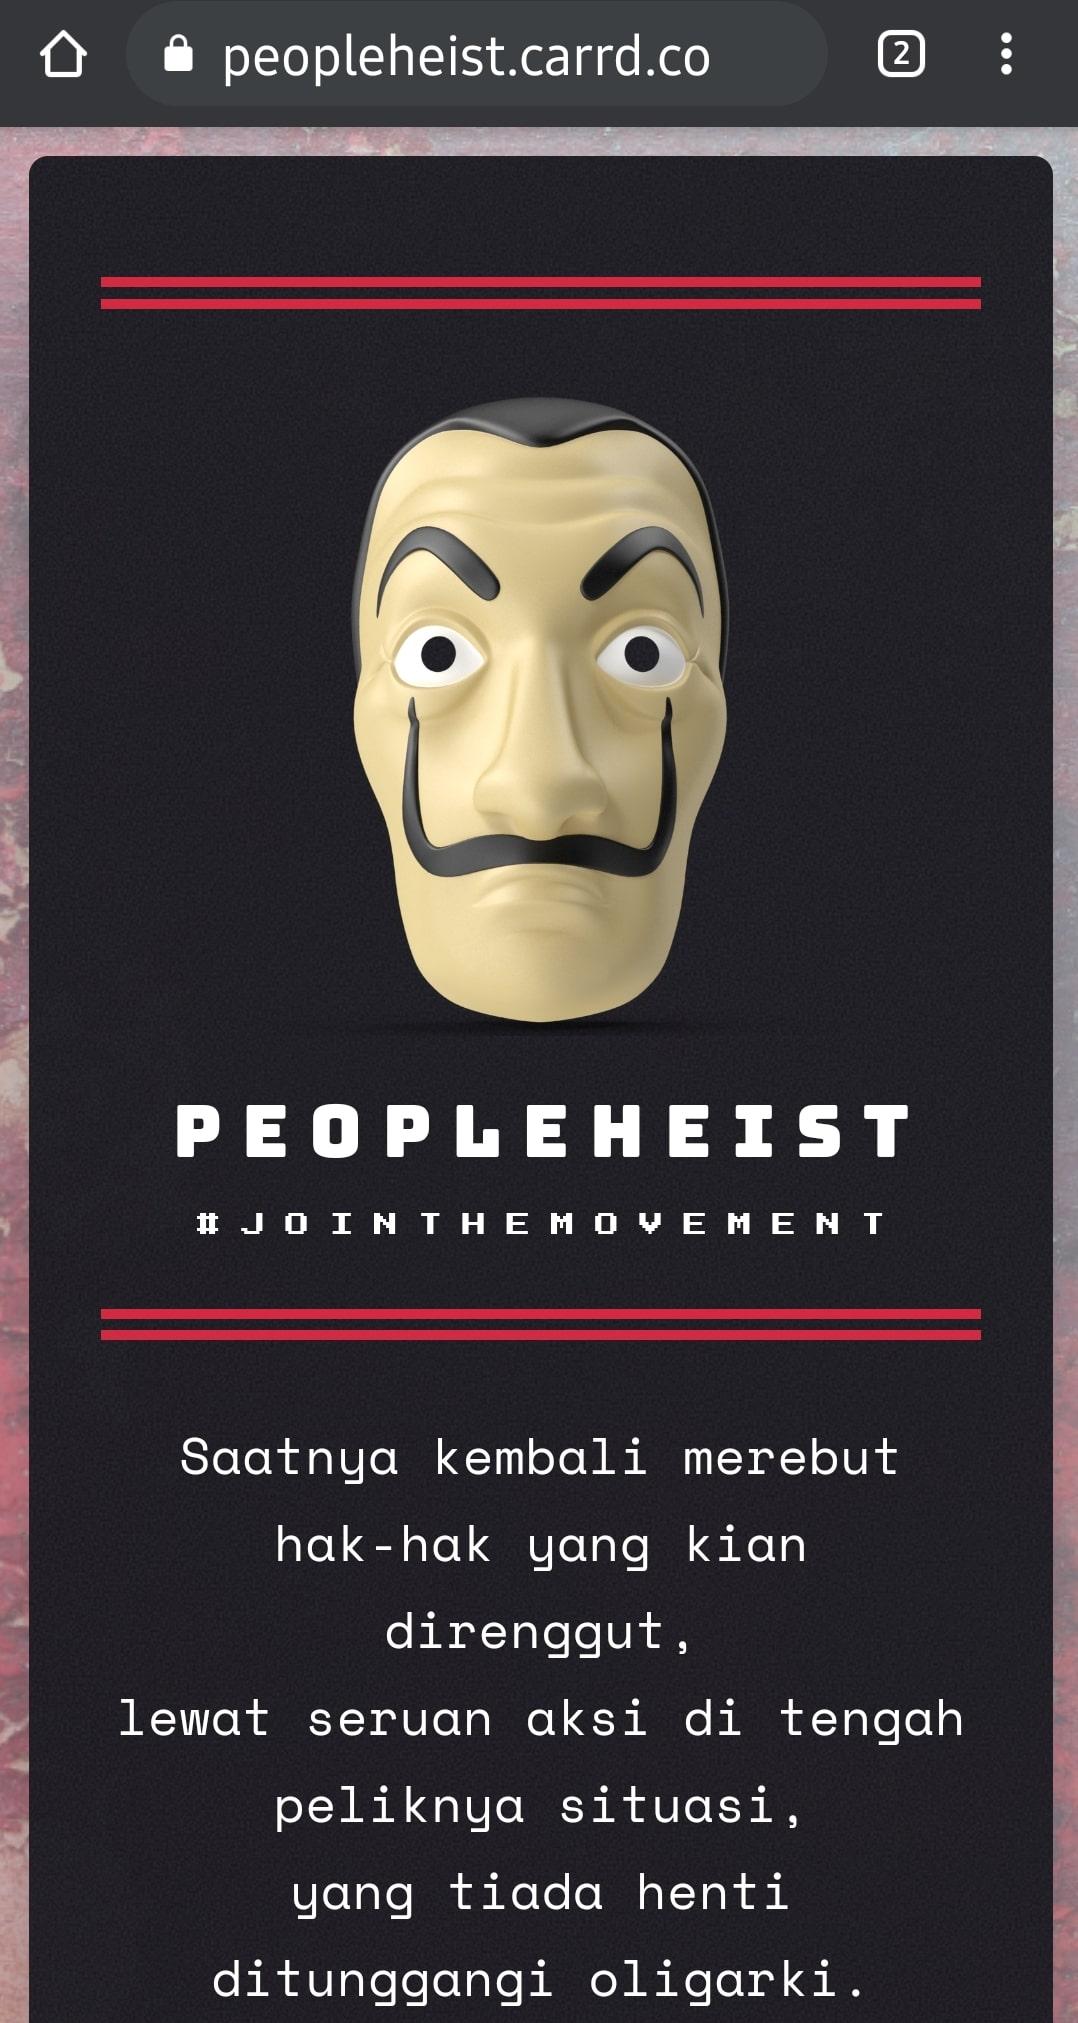 Situs People Heist versi Indonesia